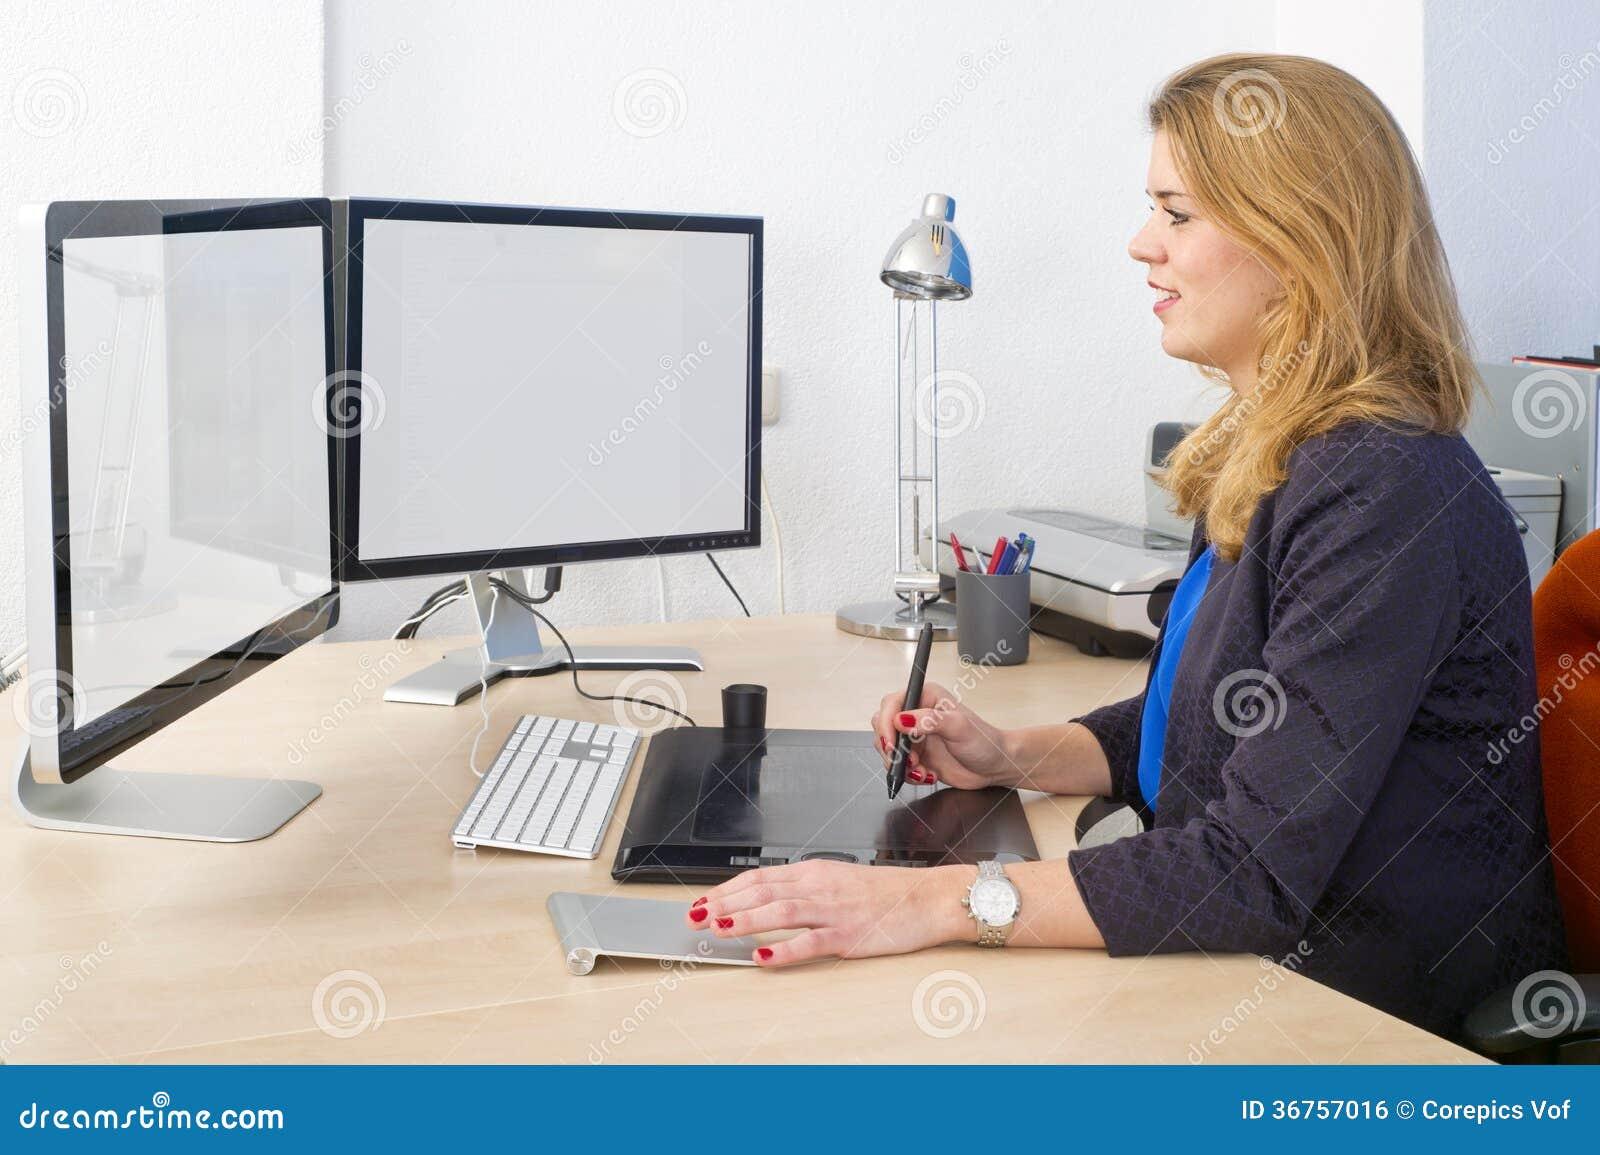 Creative office work